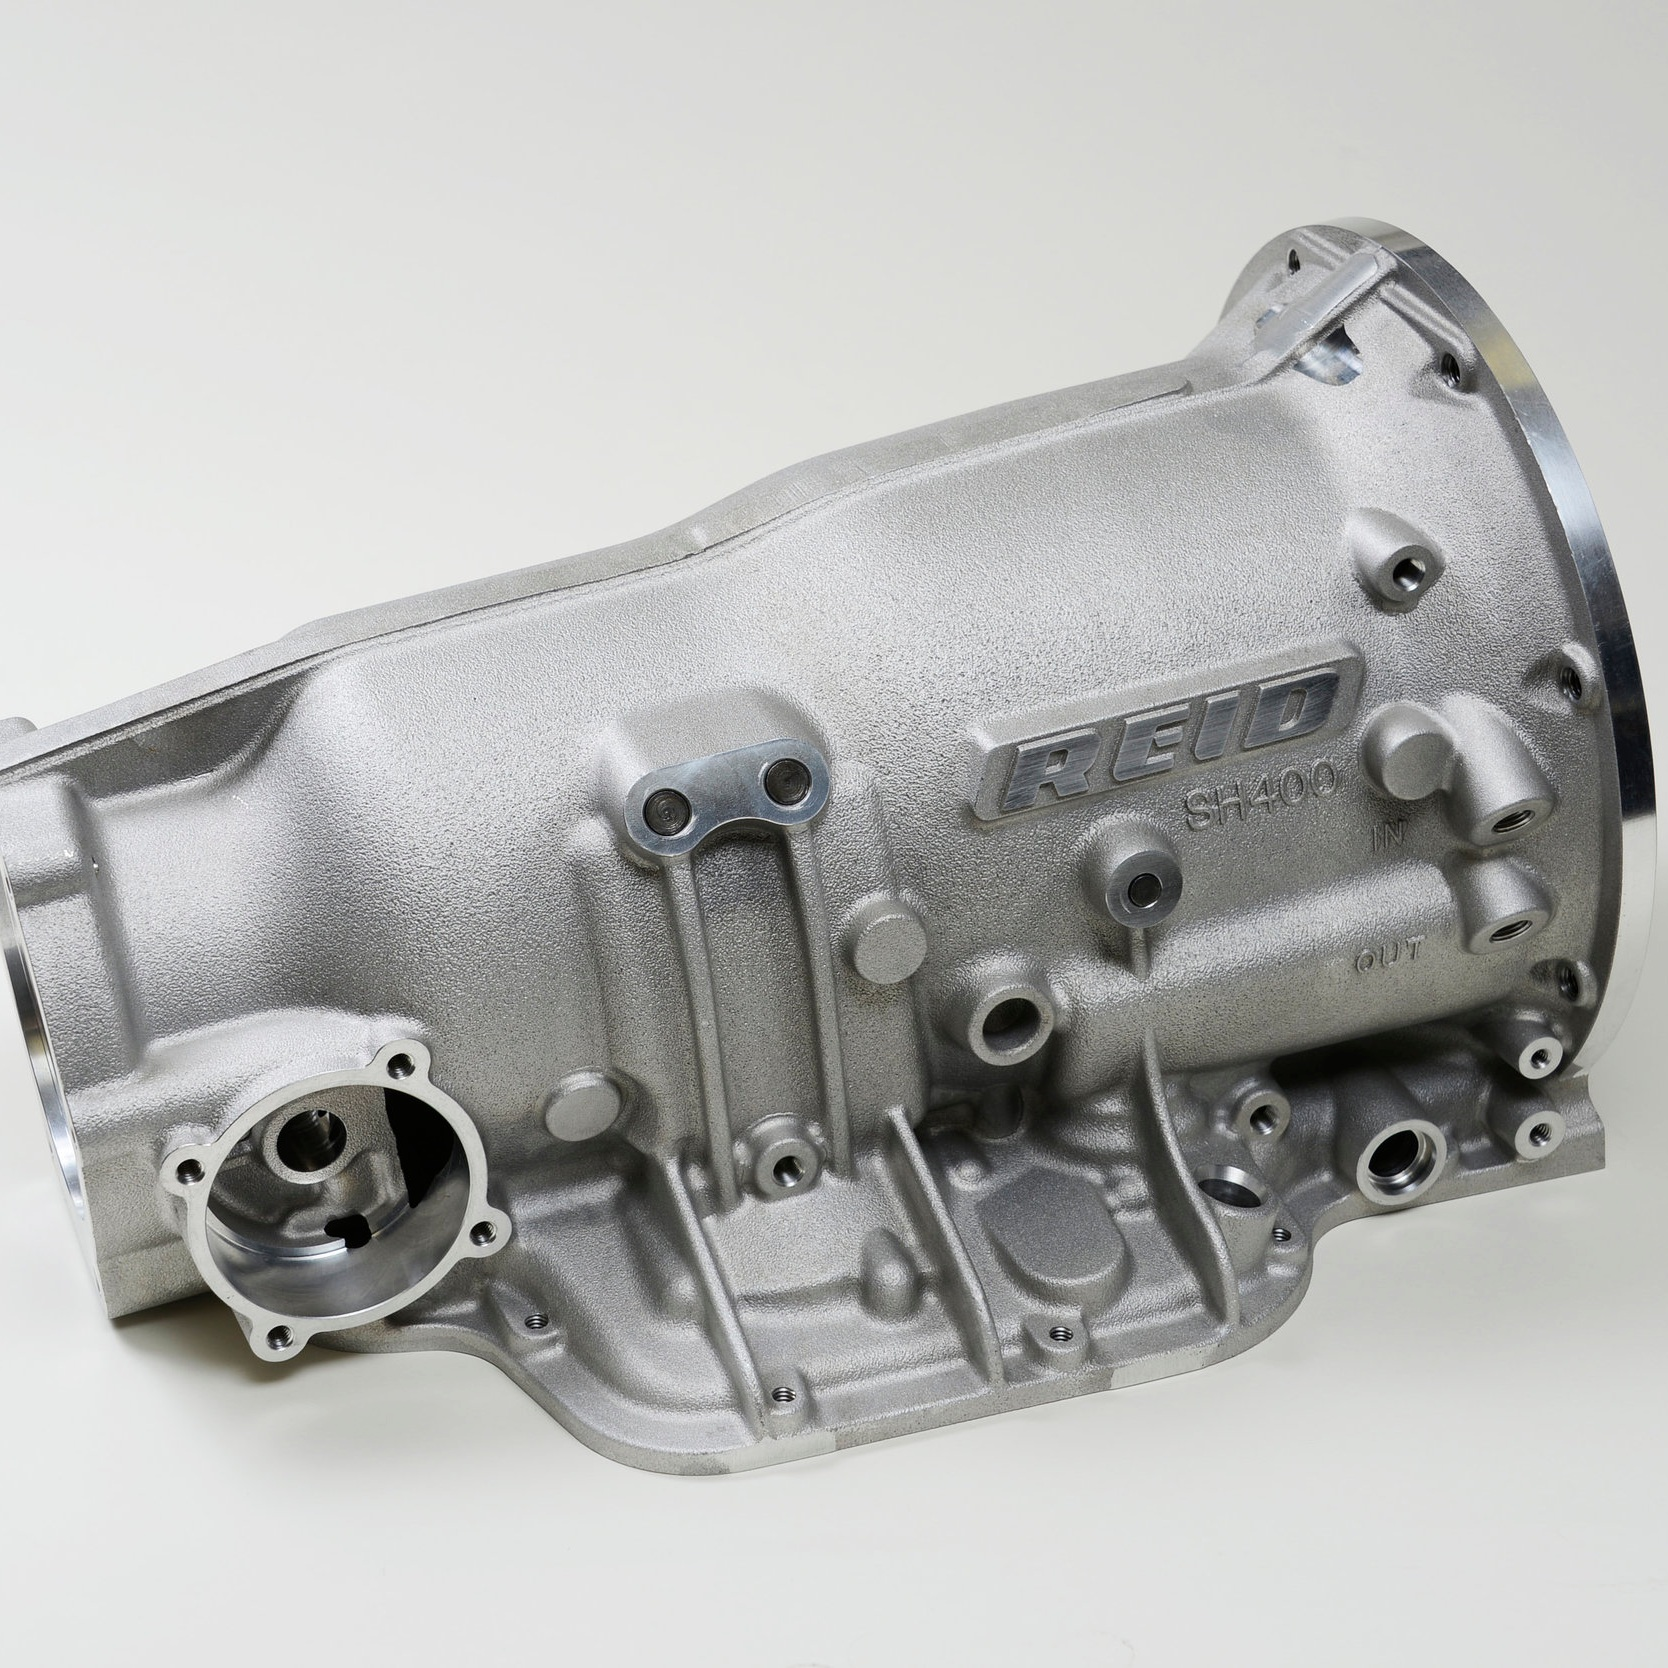 sh400 -